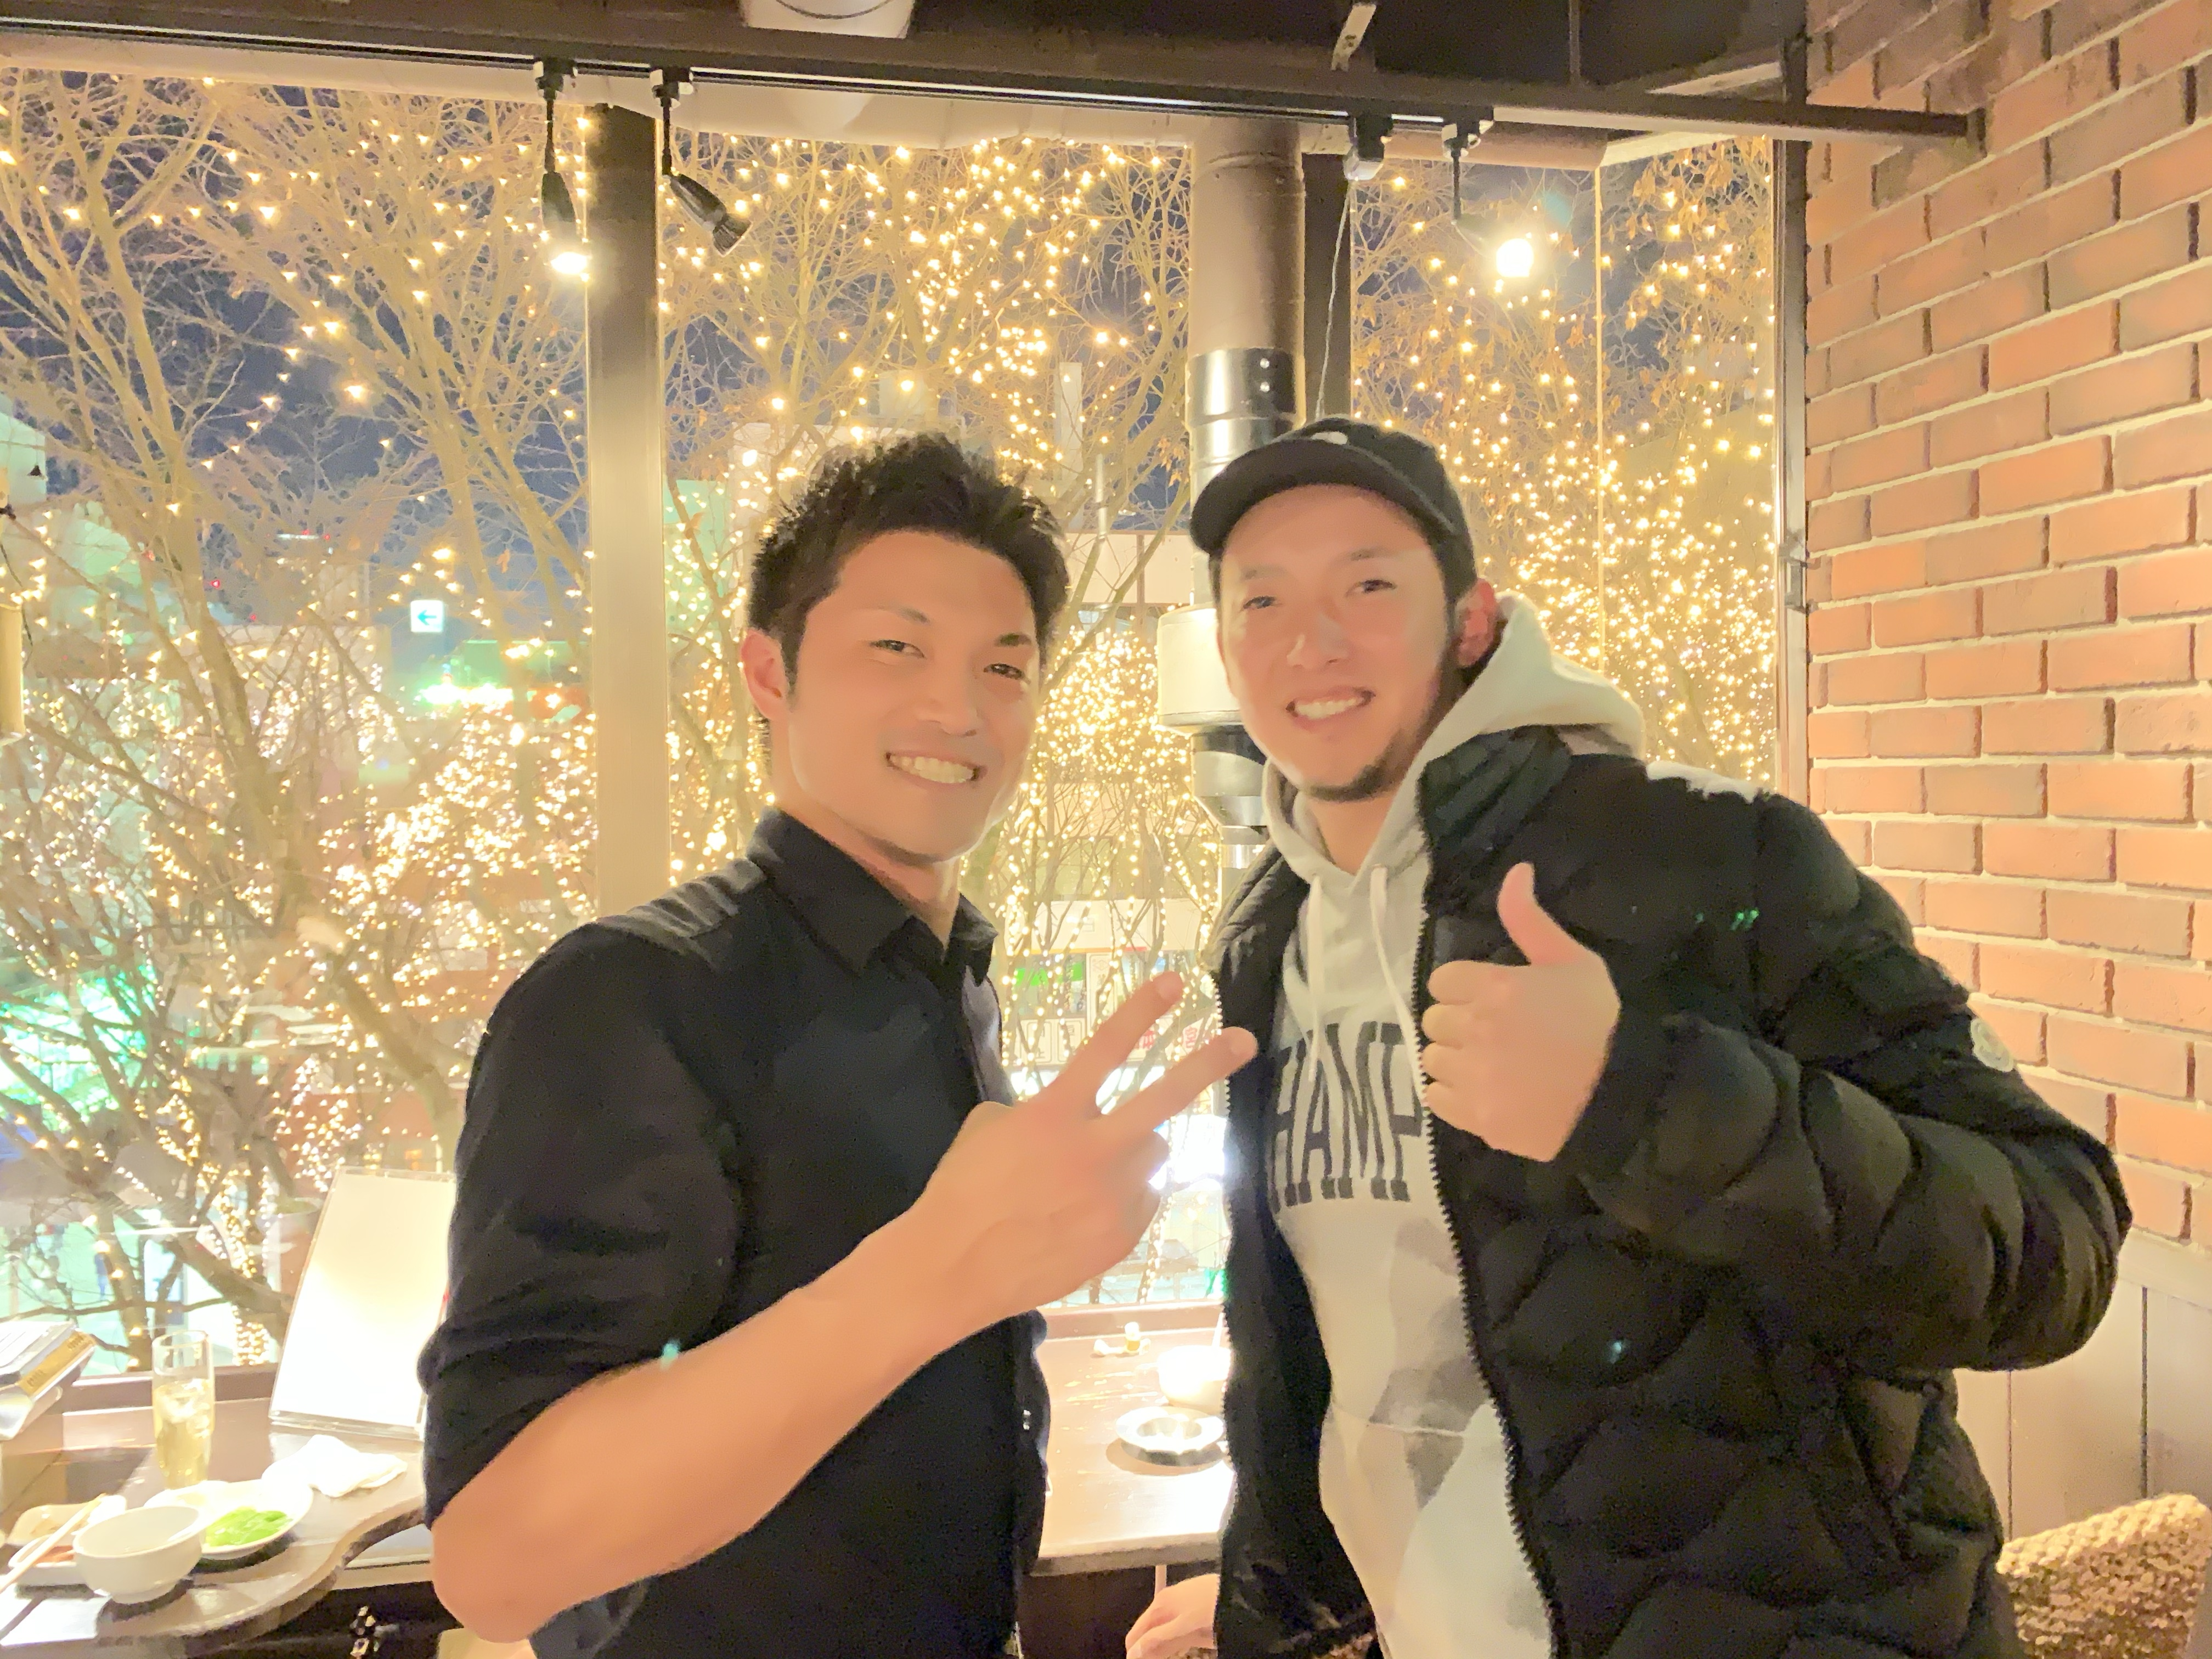 img 4837 - 元楽天の横山貴明選手がご来店